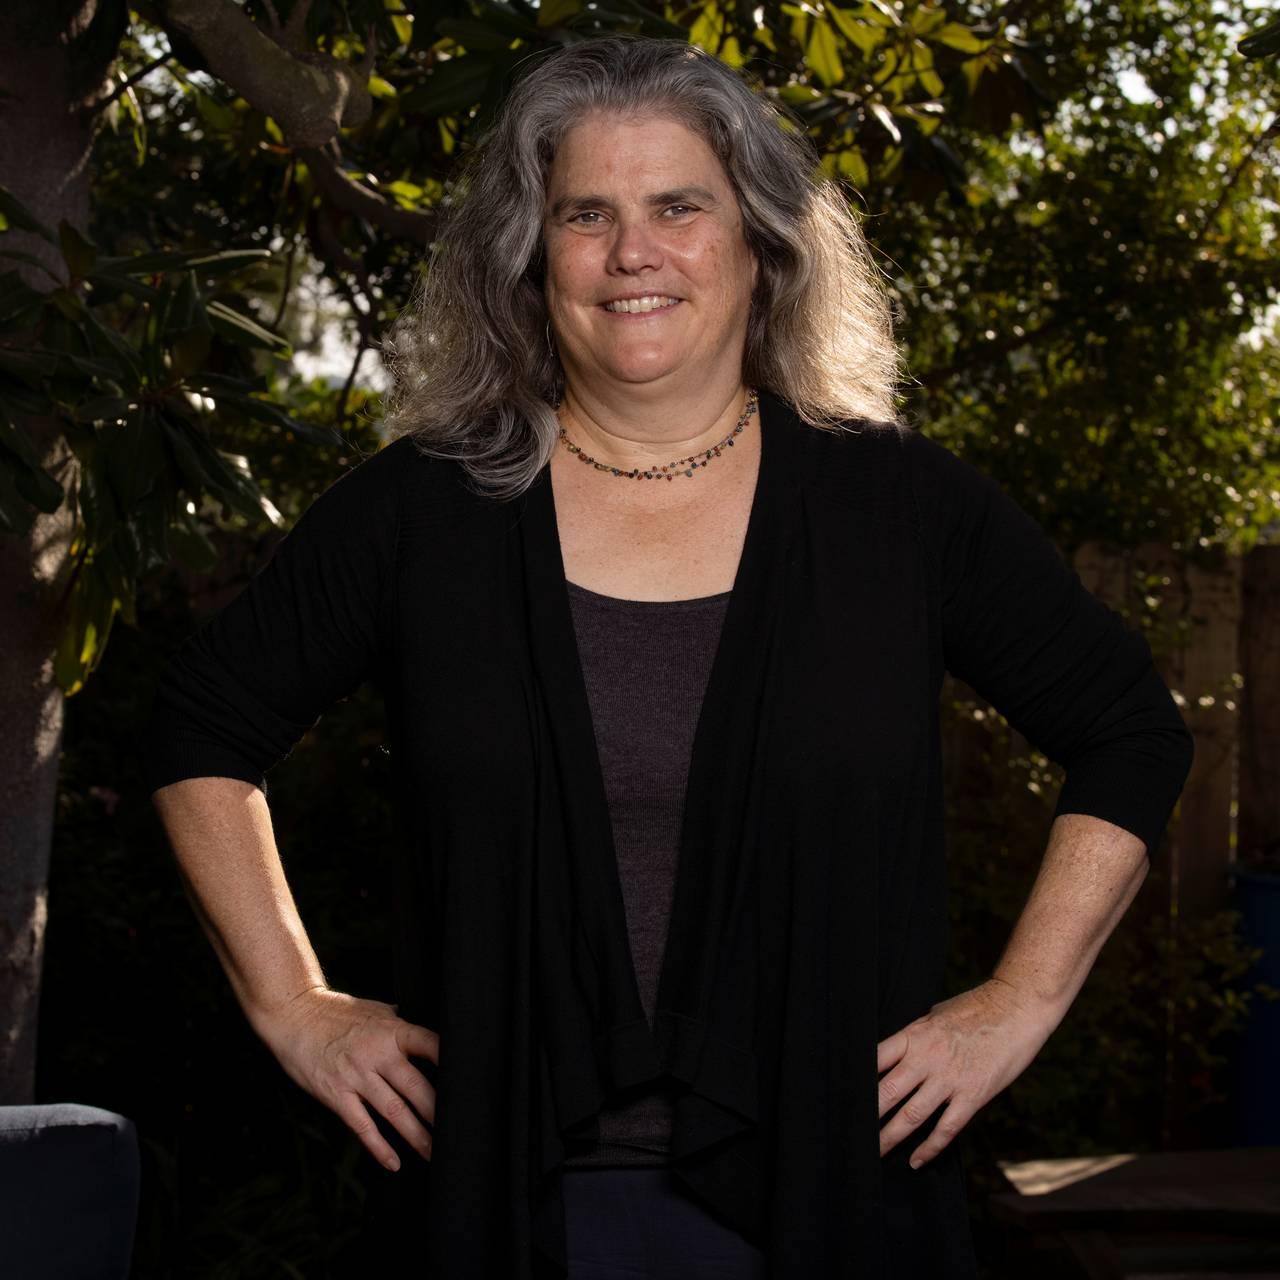 Andrea Ghez, professor i Astrophysics på Universitet i California, Los Angeles, poserer i bakgården i forbindelse med nobelprisen 2020